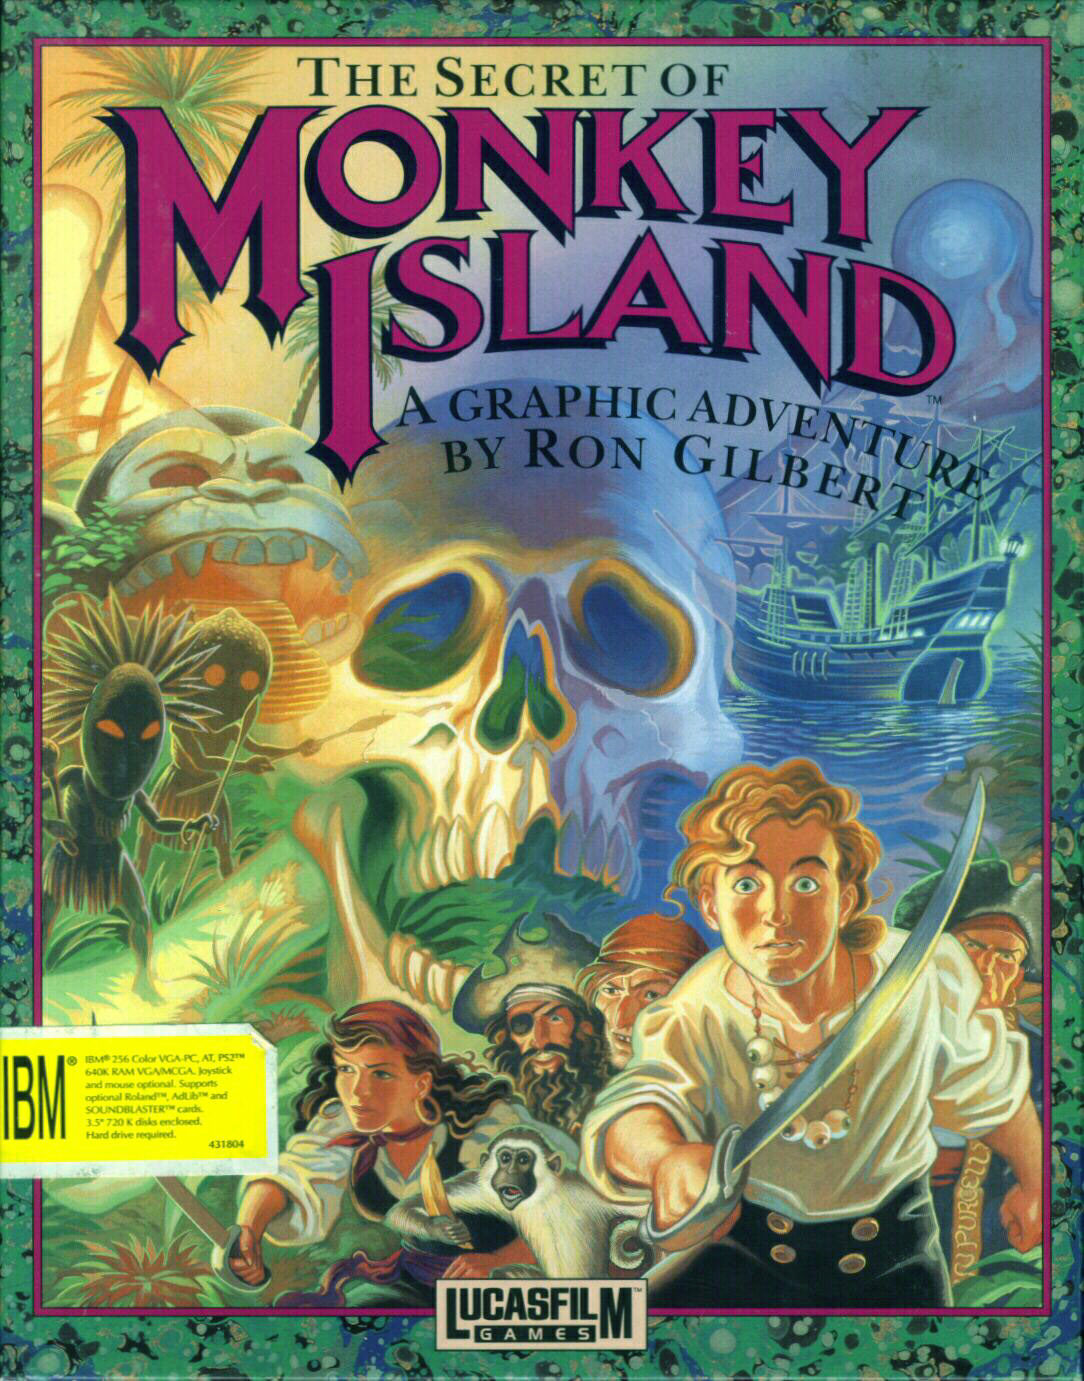 monkey_island_lucasfilm_games_ibm_pc_version_originale_1990-9449244